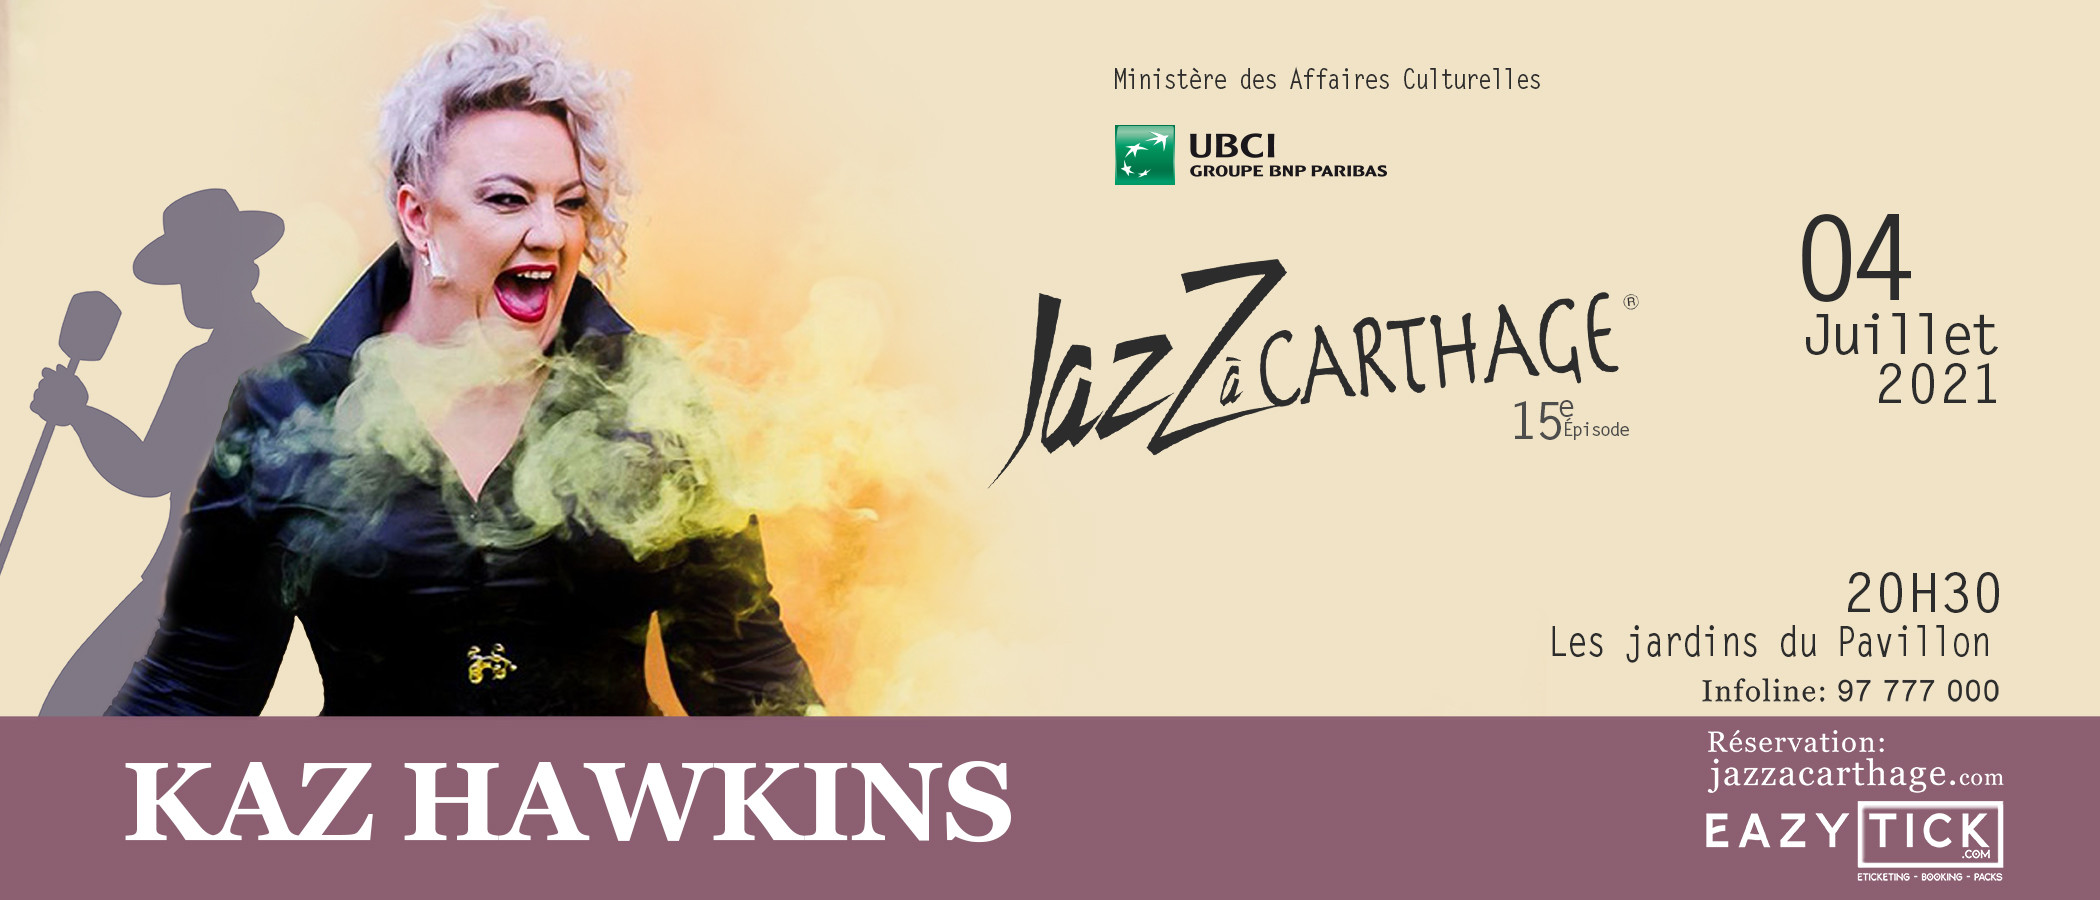 Kaz Hawkins